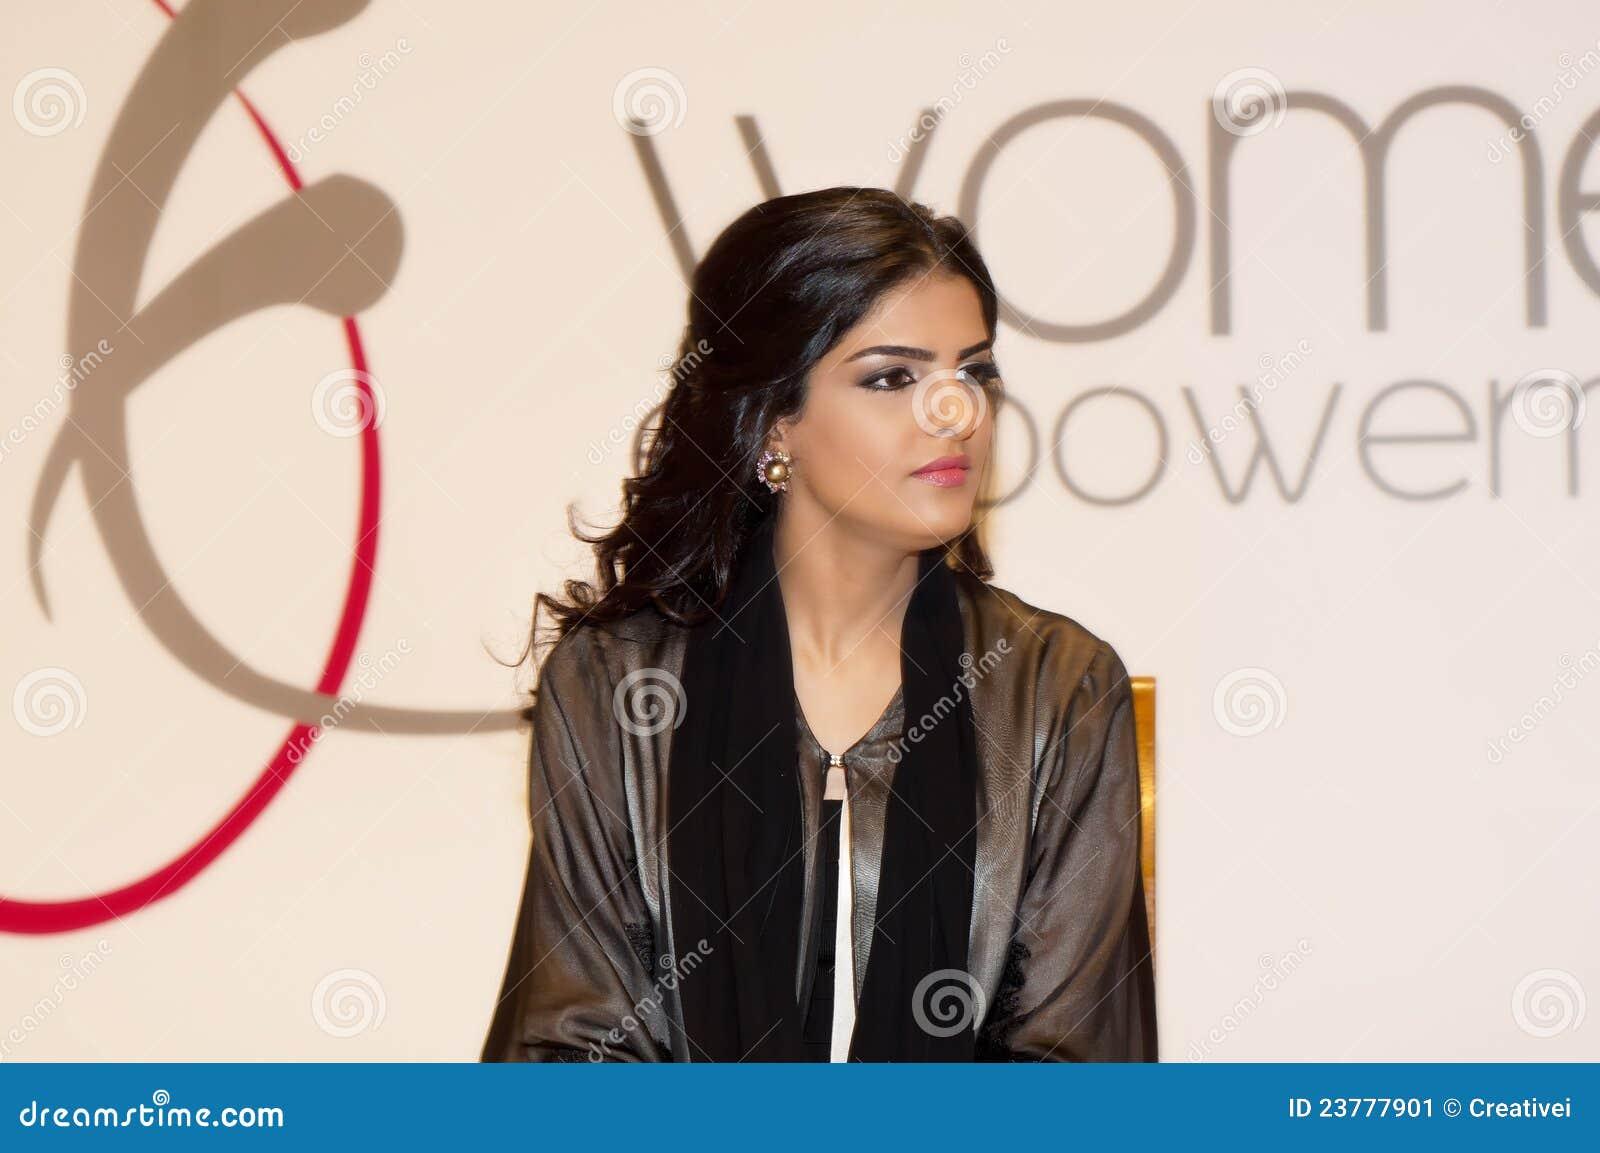 Her Highness Princess Ameerah Al Taweel Editorial Photo ... Prince Alwaleed Bin Talal Wife Amira